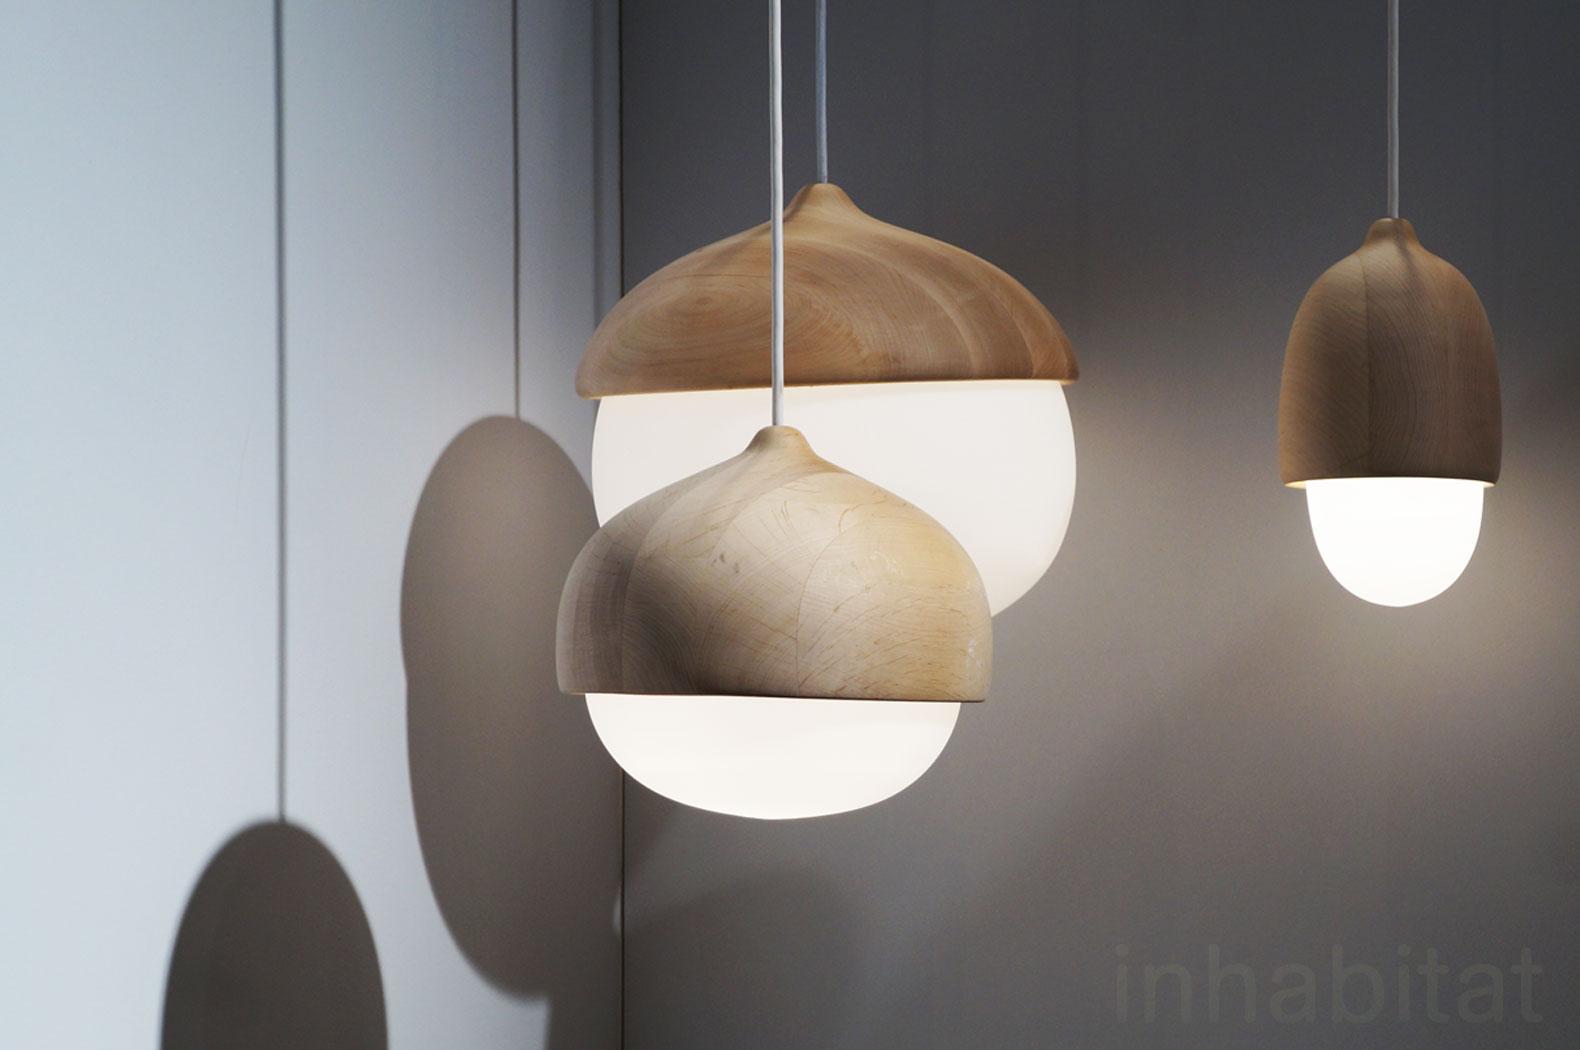 28 inspiring lighting designs from New York Design Week